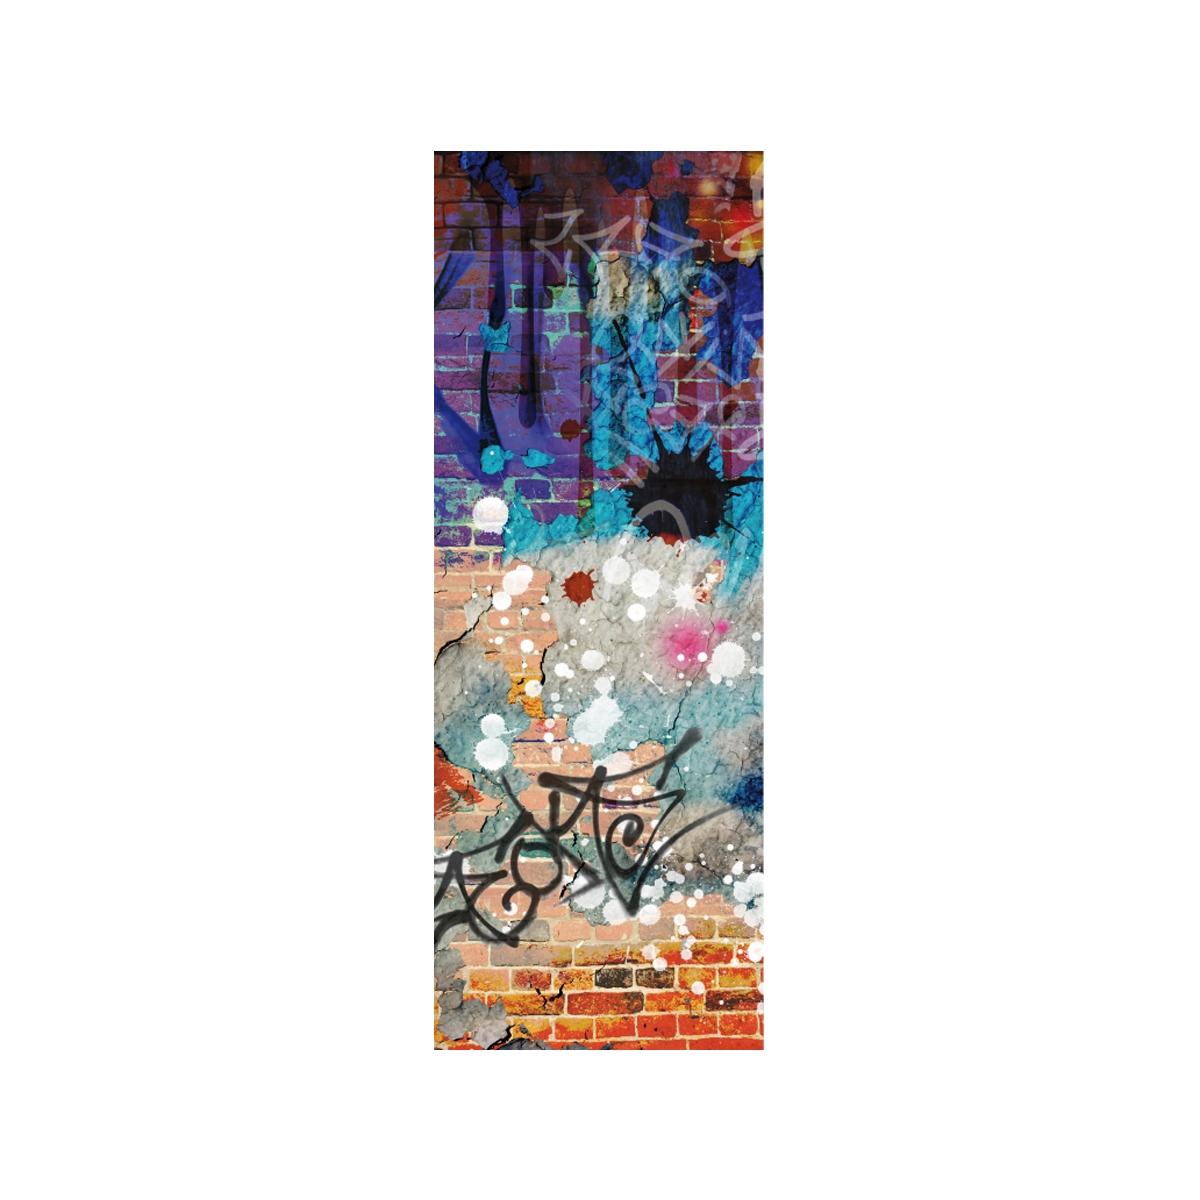 pin multicolor graffiti street art hd wallpaper city on pinterest. Black Bedroom Furniture Sets. Home Design Ideas